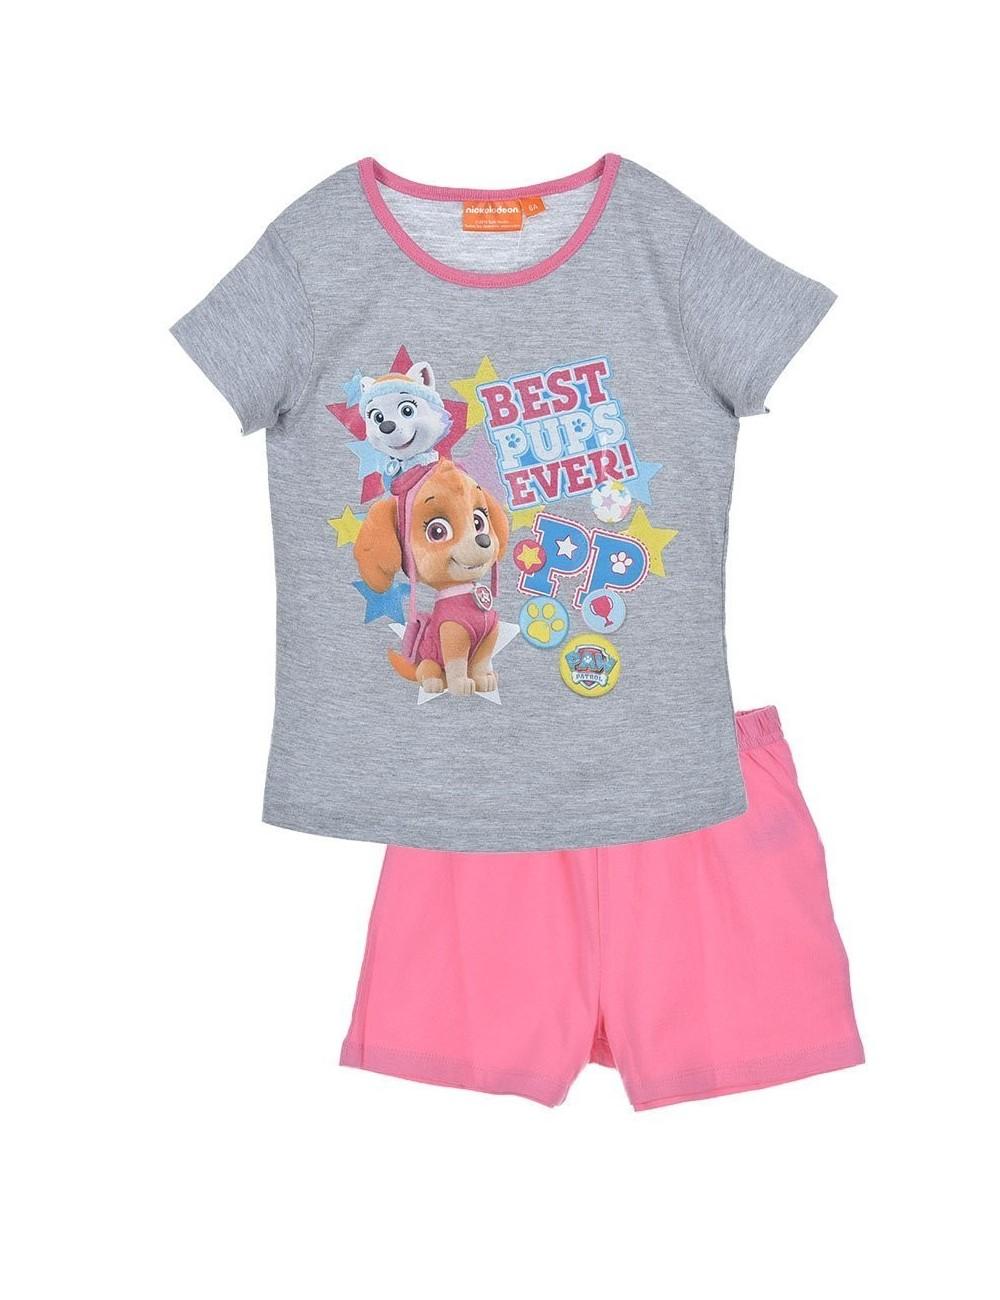 previzualizare a comercializează oferta specifica Pijama vara 3-6 ani, Paw Patrol, gri-roz